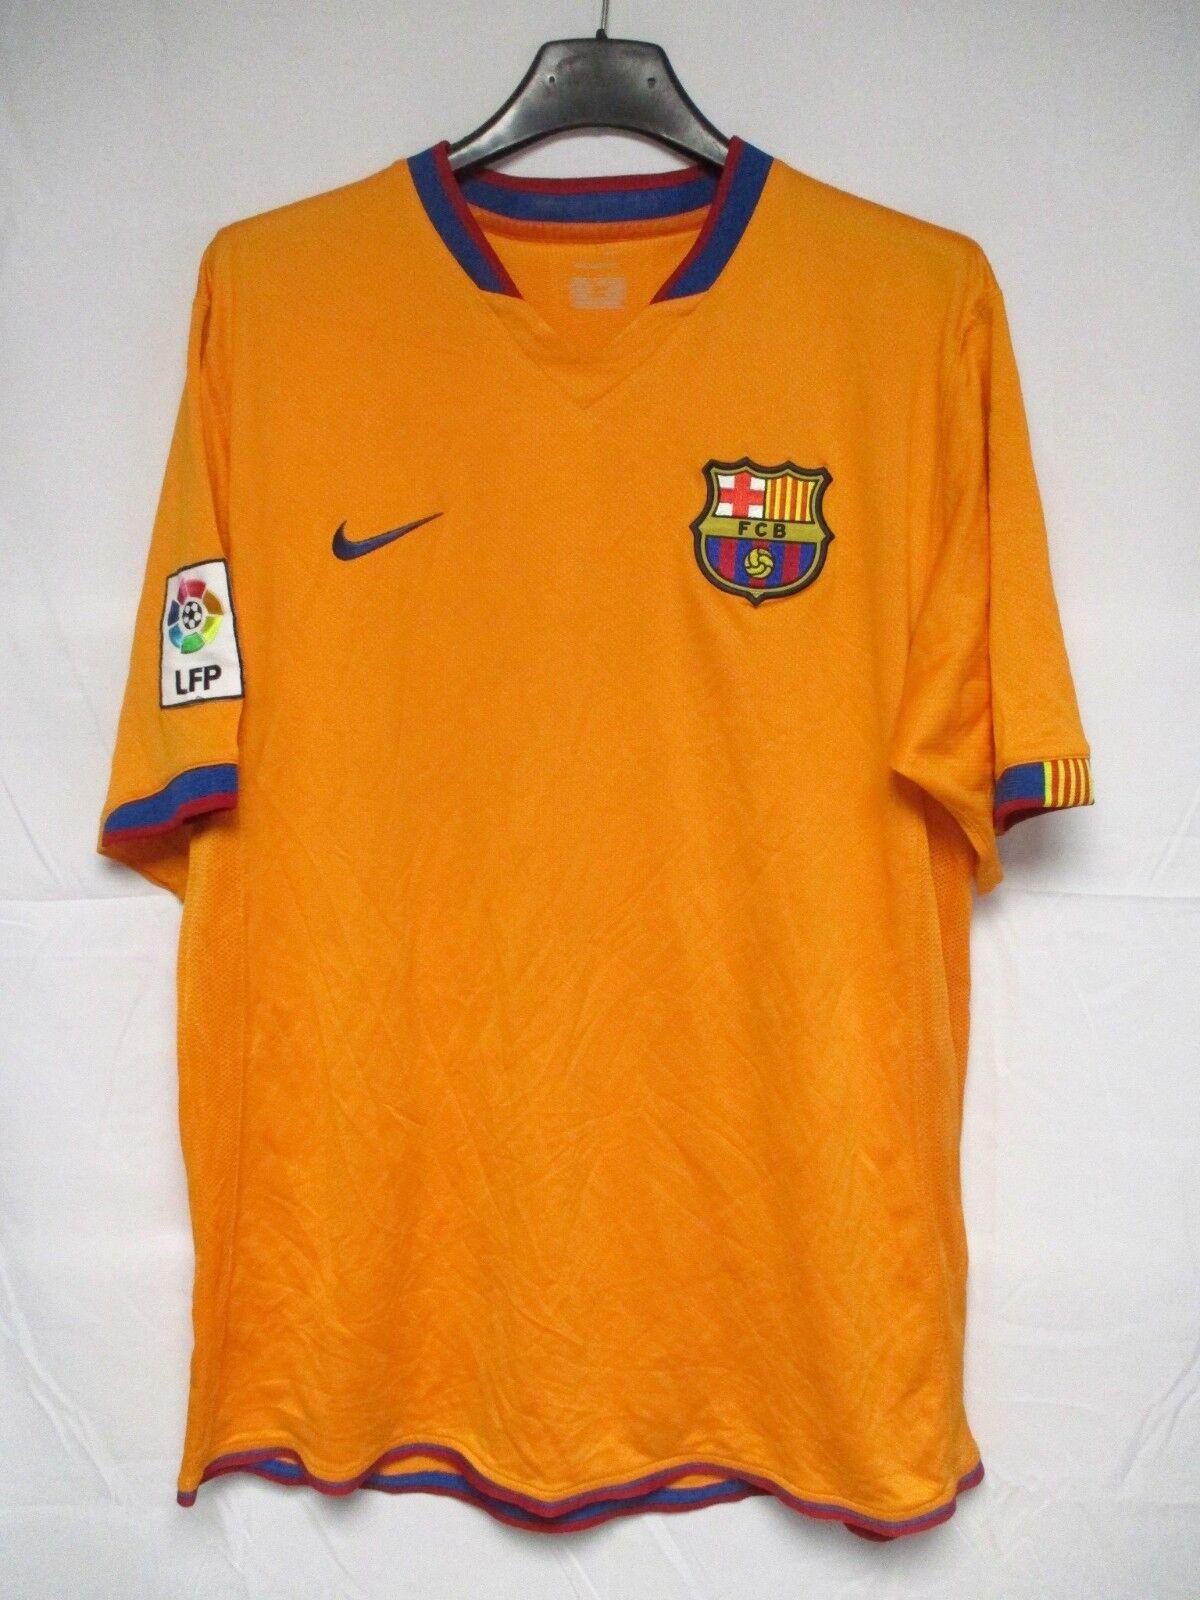 Maillot F.C BARCELONE BARCELONA 2007 vintage NIKE shirt away jersey camiseta M